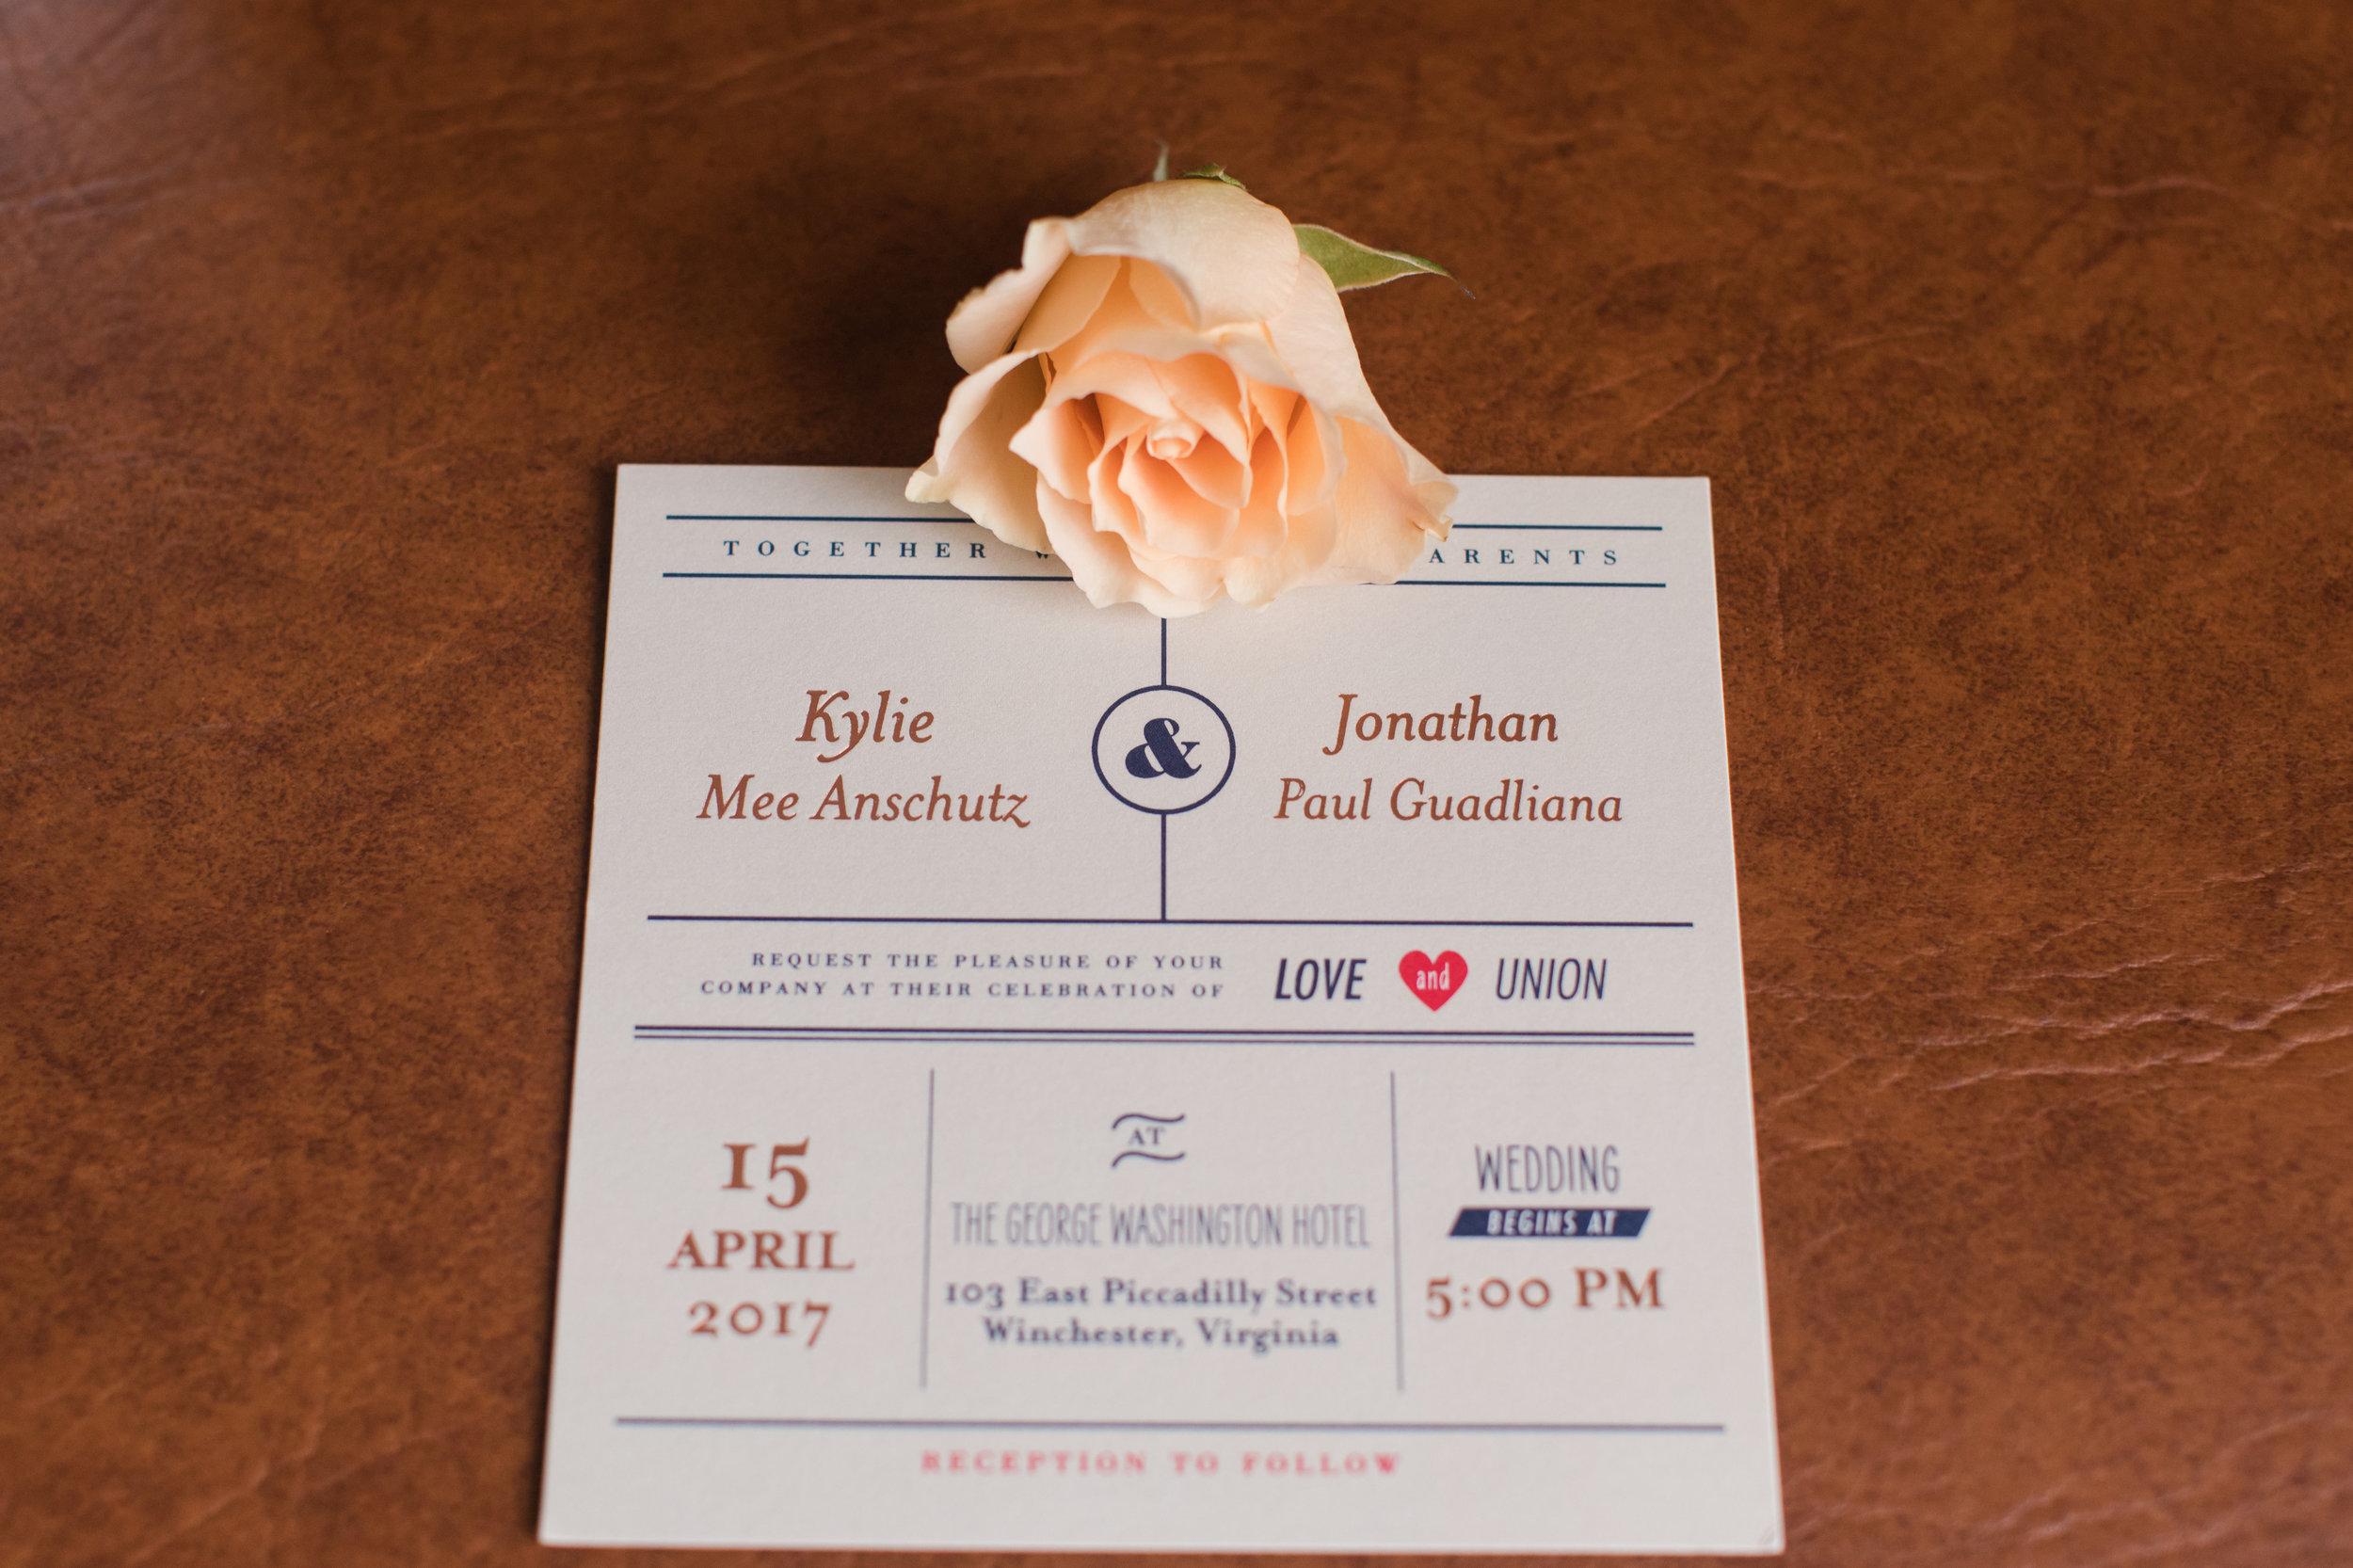 Unique Postcard Style Wedding Invitation - A Classic George Washington Hotel Wedding - Photography by Marirosa